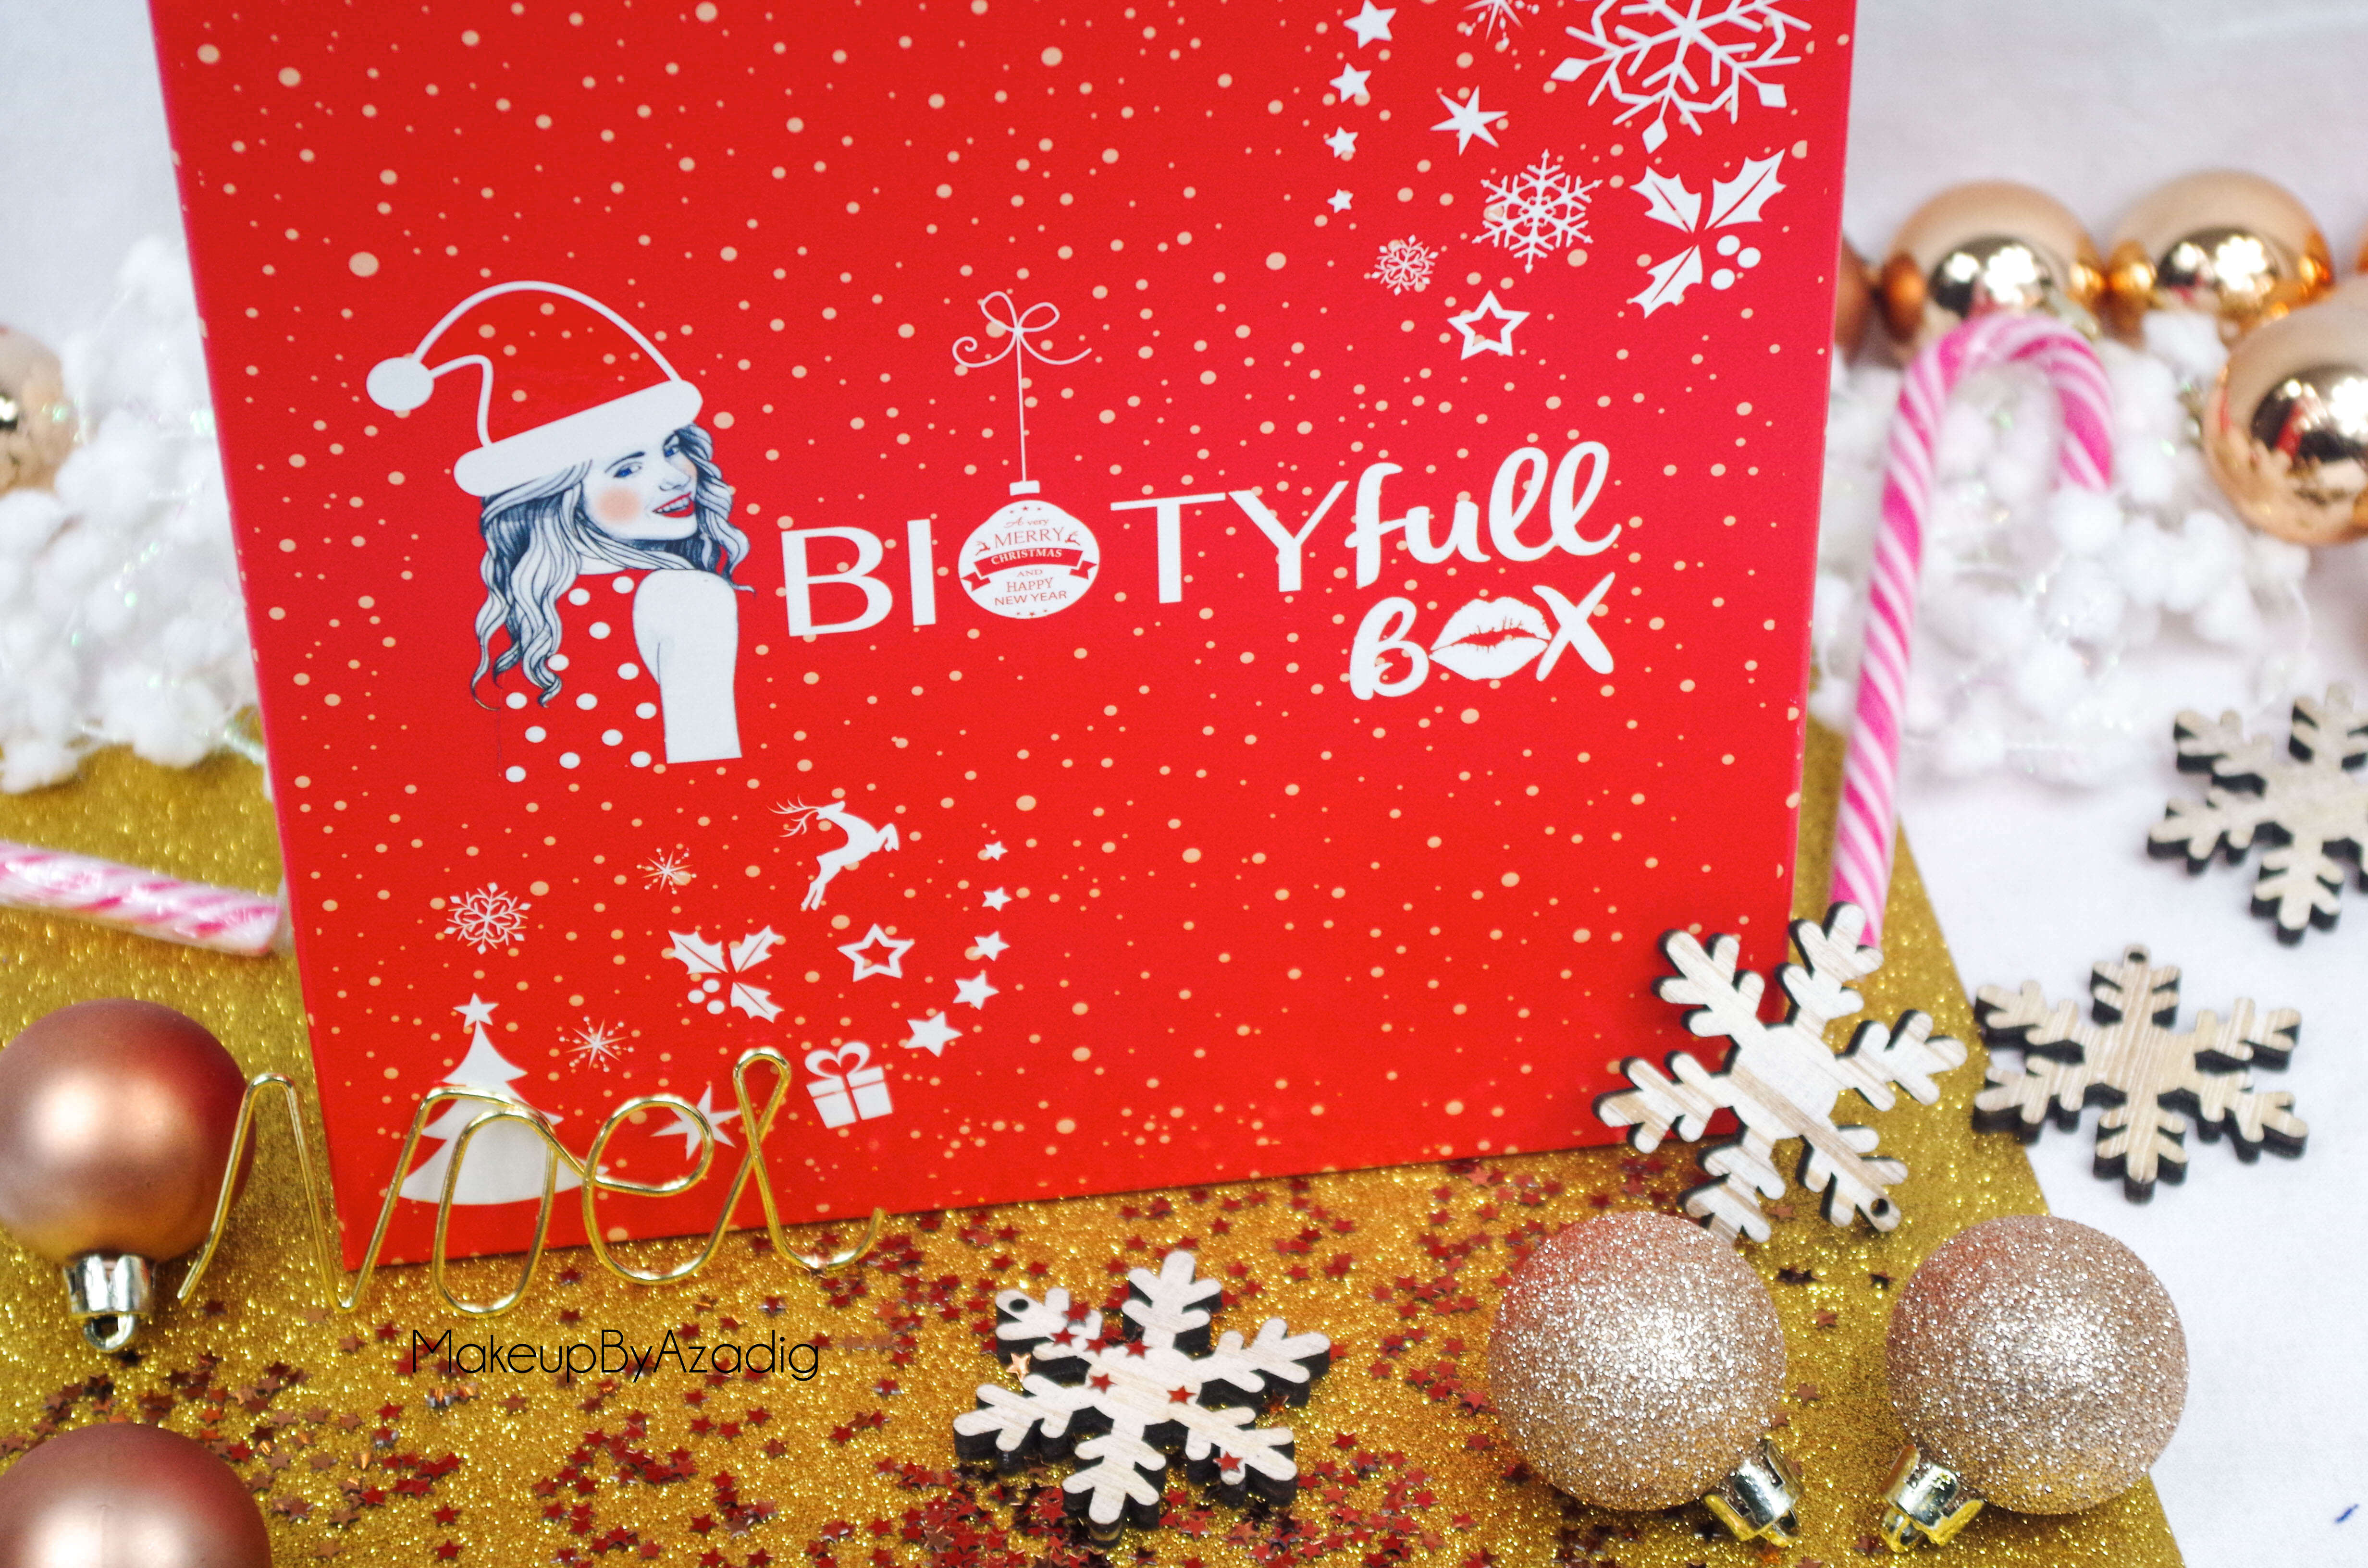 biotyfull-box-beaute-makeupbyazadig-revue-avis-prix-troyes-paris-produits-bio-christmas